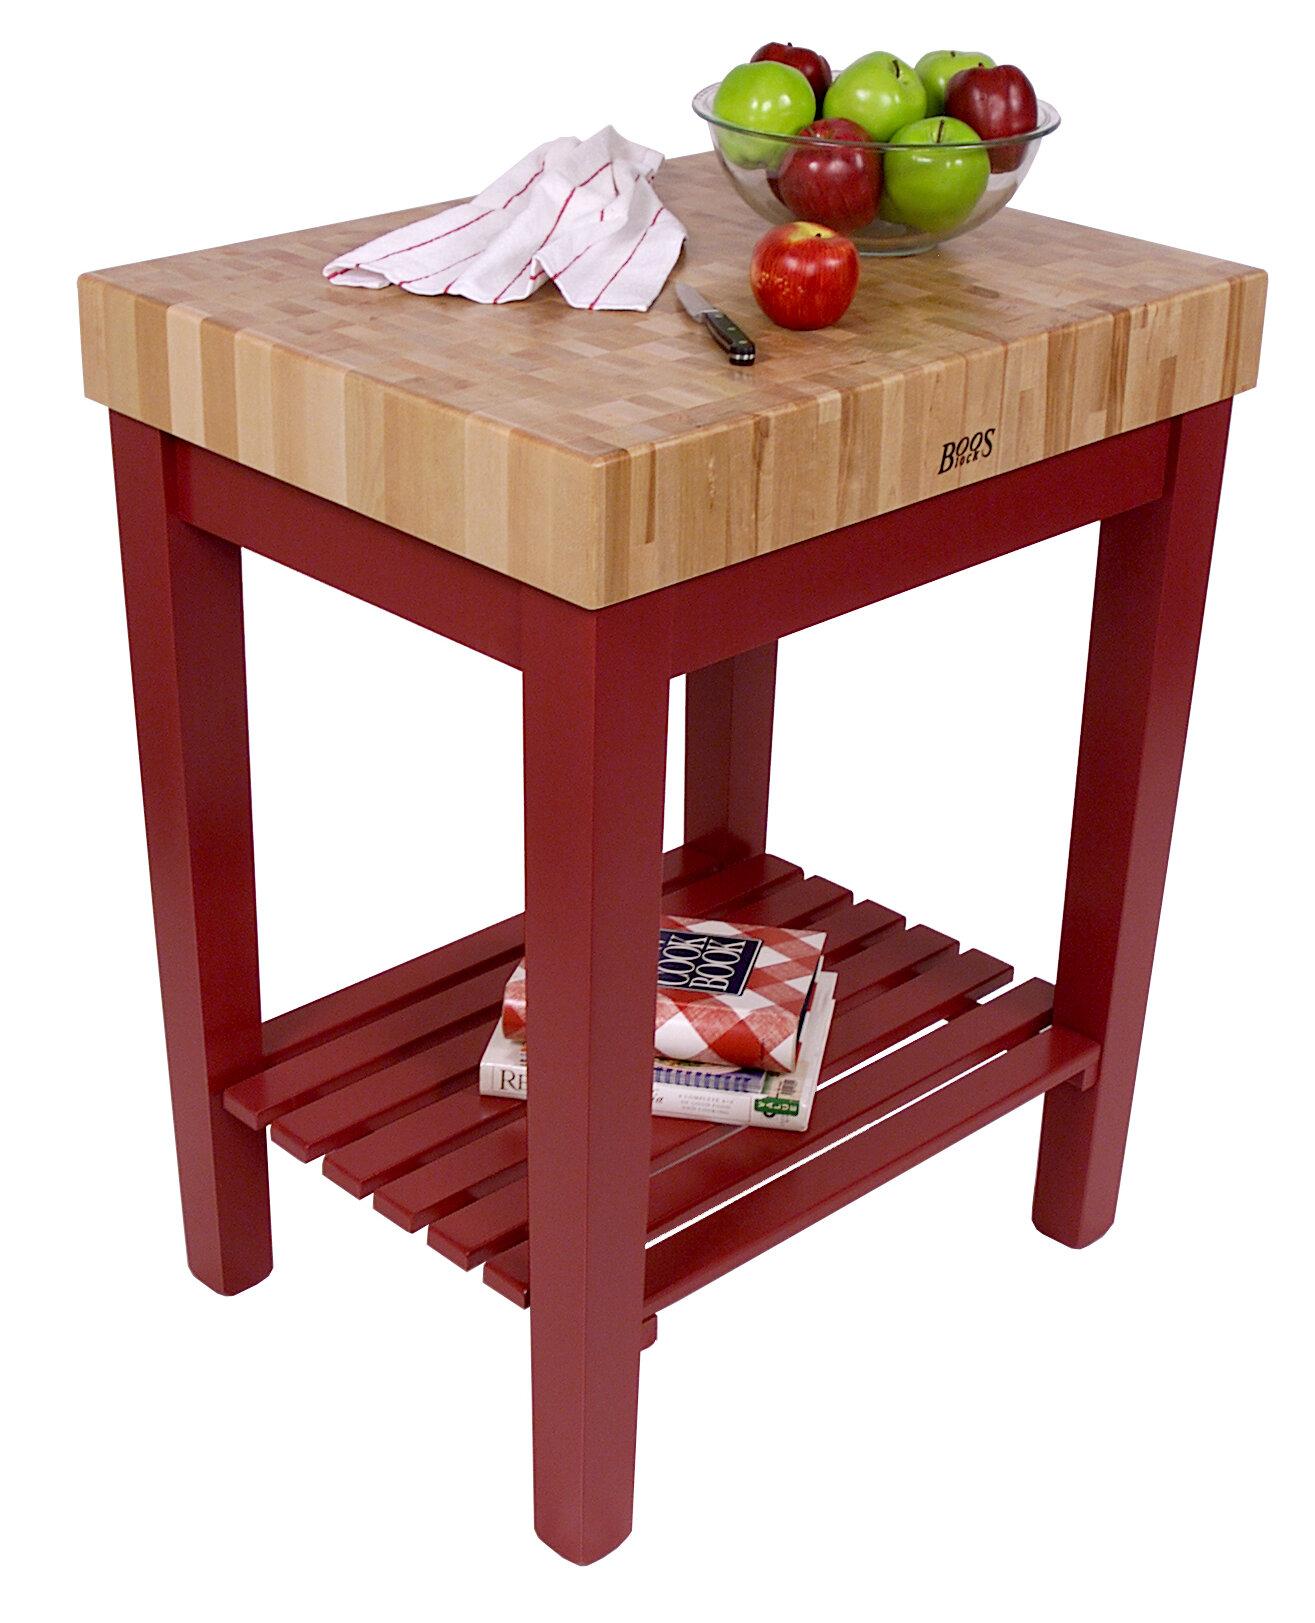 Kitchen Table With Butcher Block Top : John Boos American Heritage Prep Table with Butcher Block Top eBay